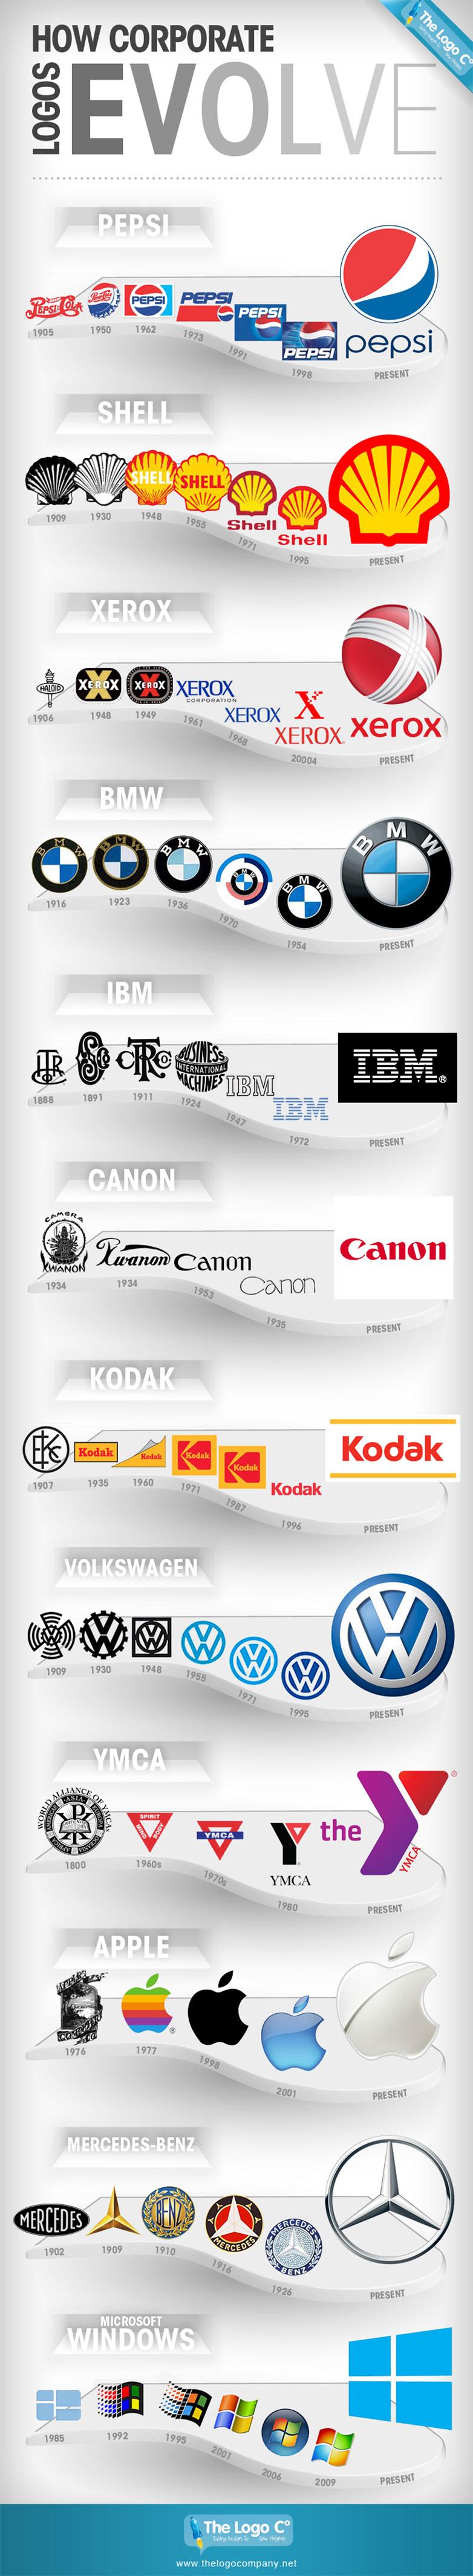 Logos_Evolve-Infographic